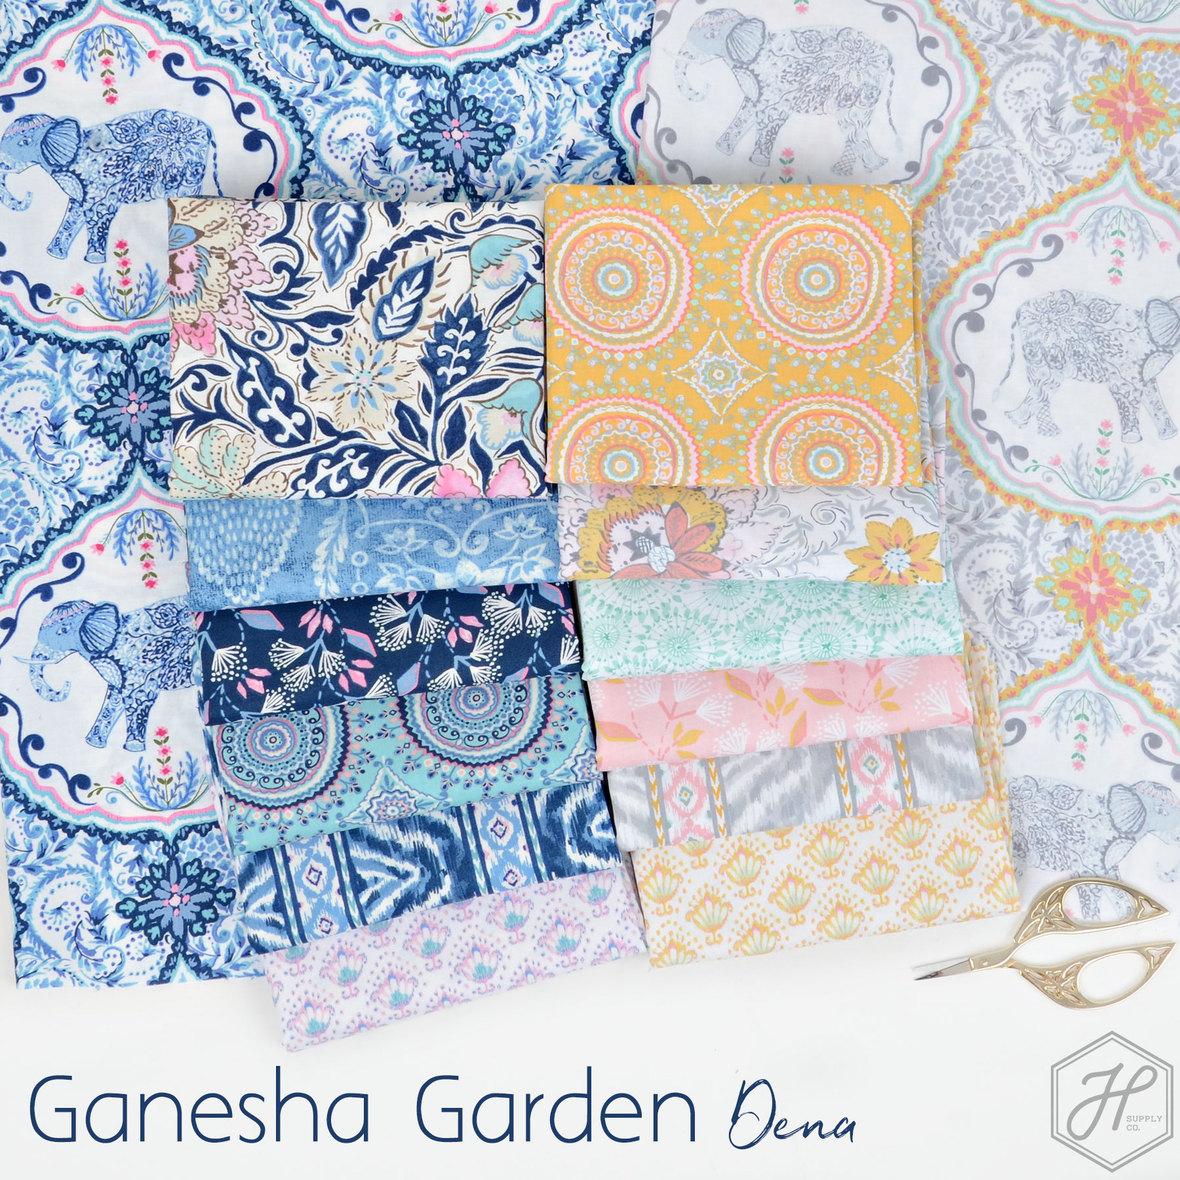 Ganesha-Garden-Fabric-Dena-at-Hawthorne-Supply-Co